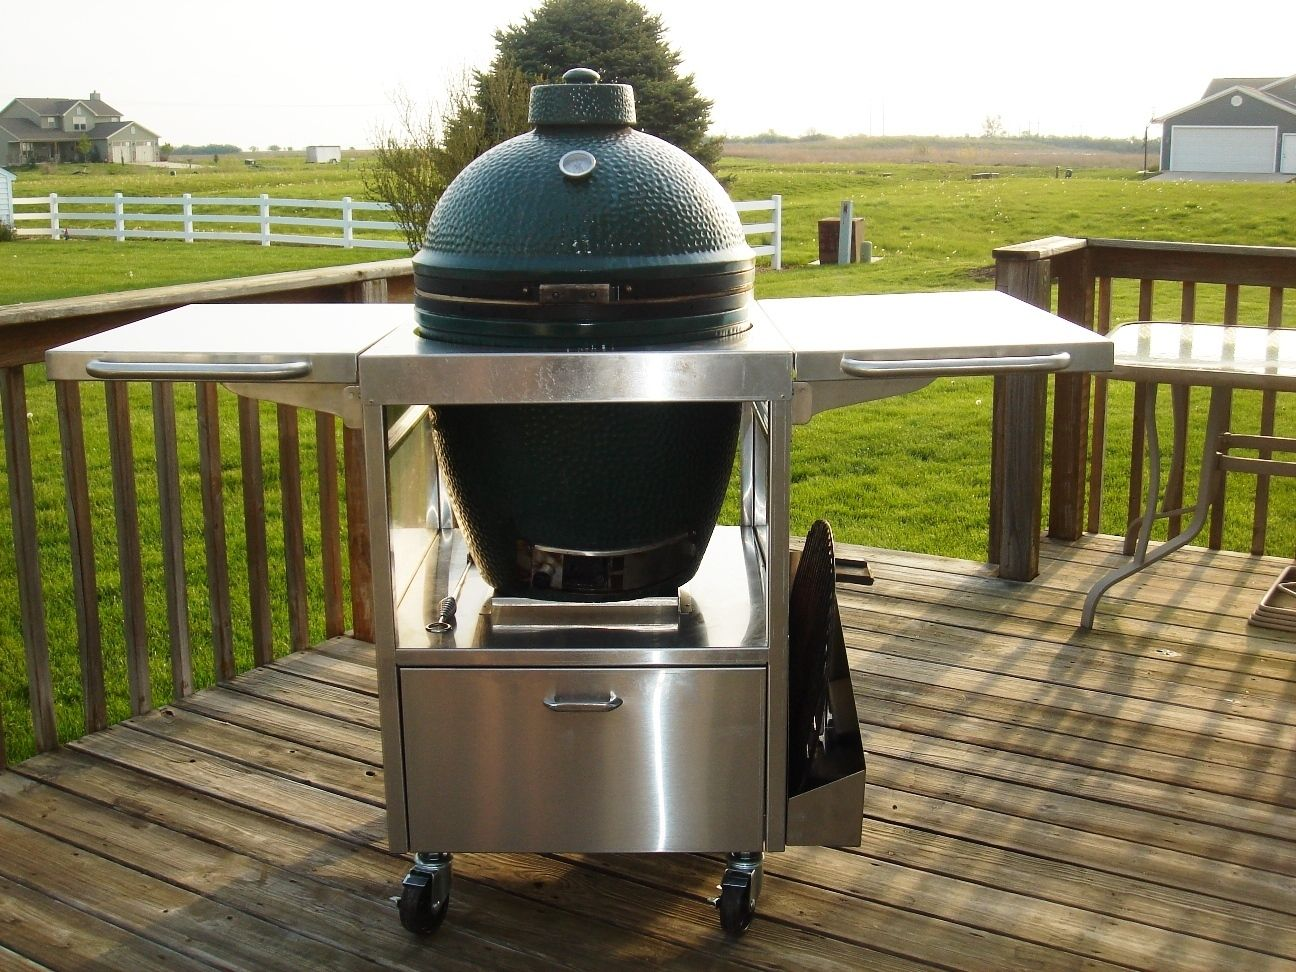 Stainless Steel Cart Table For Big Green Egg Or Kamado | EBay